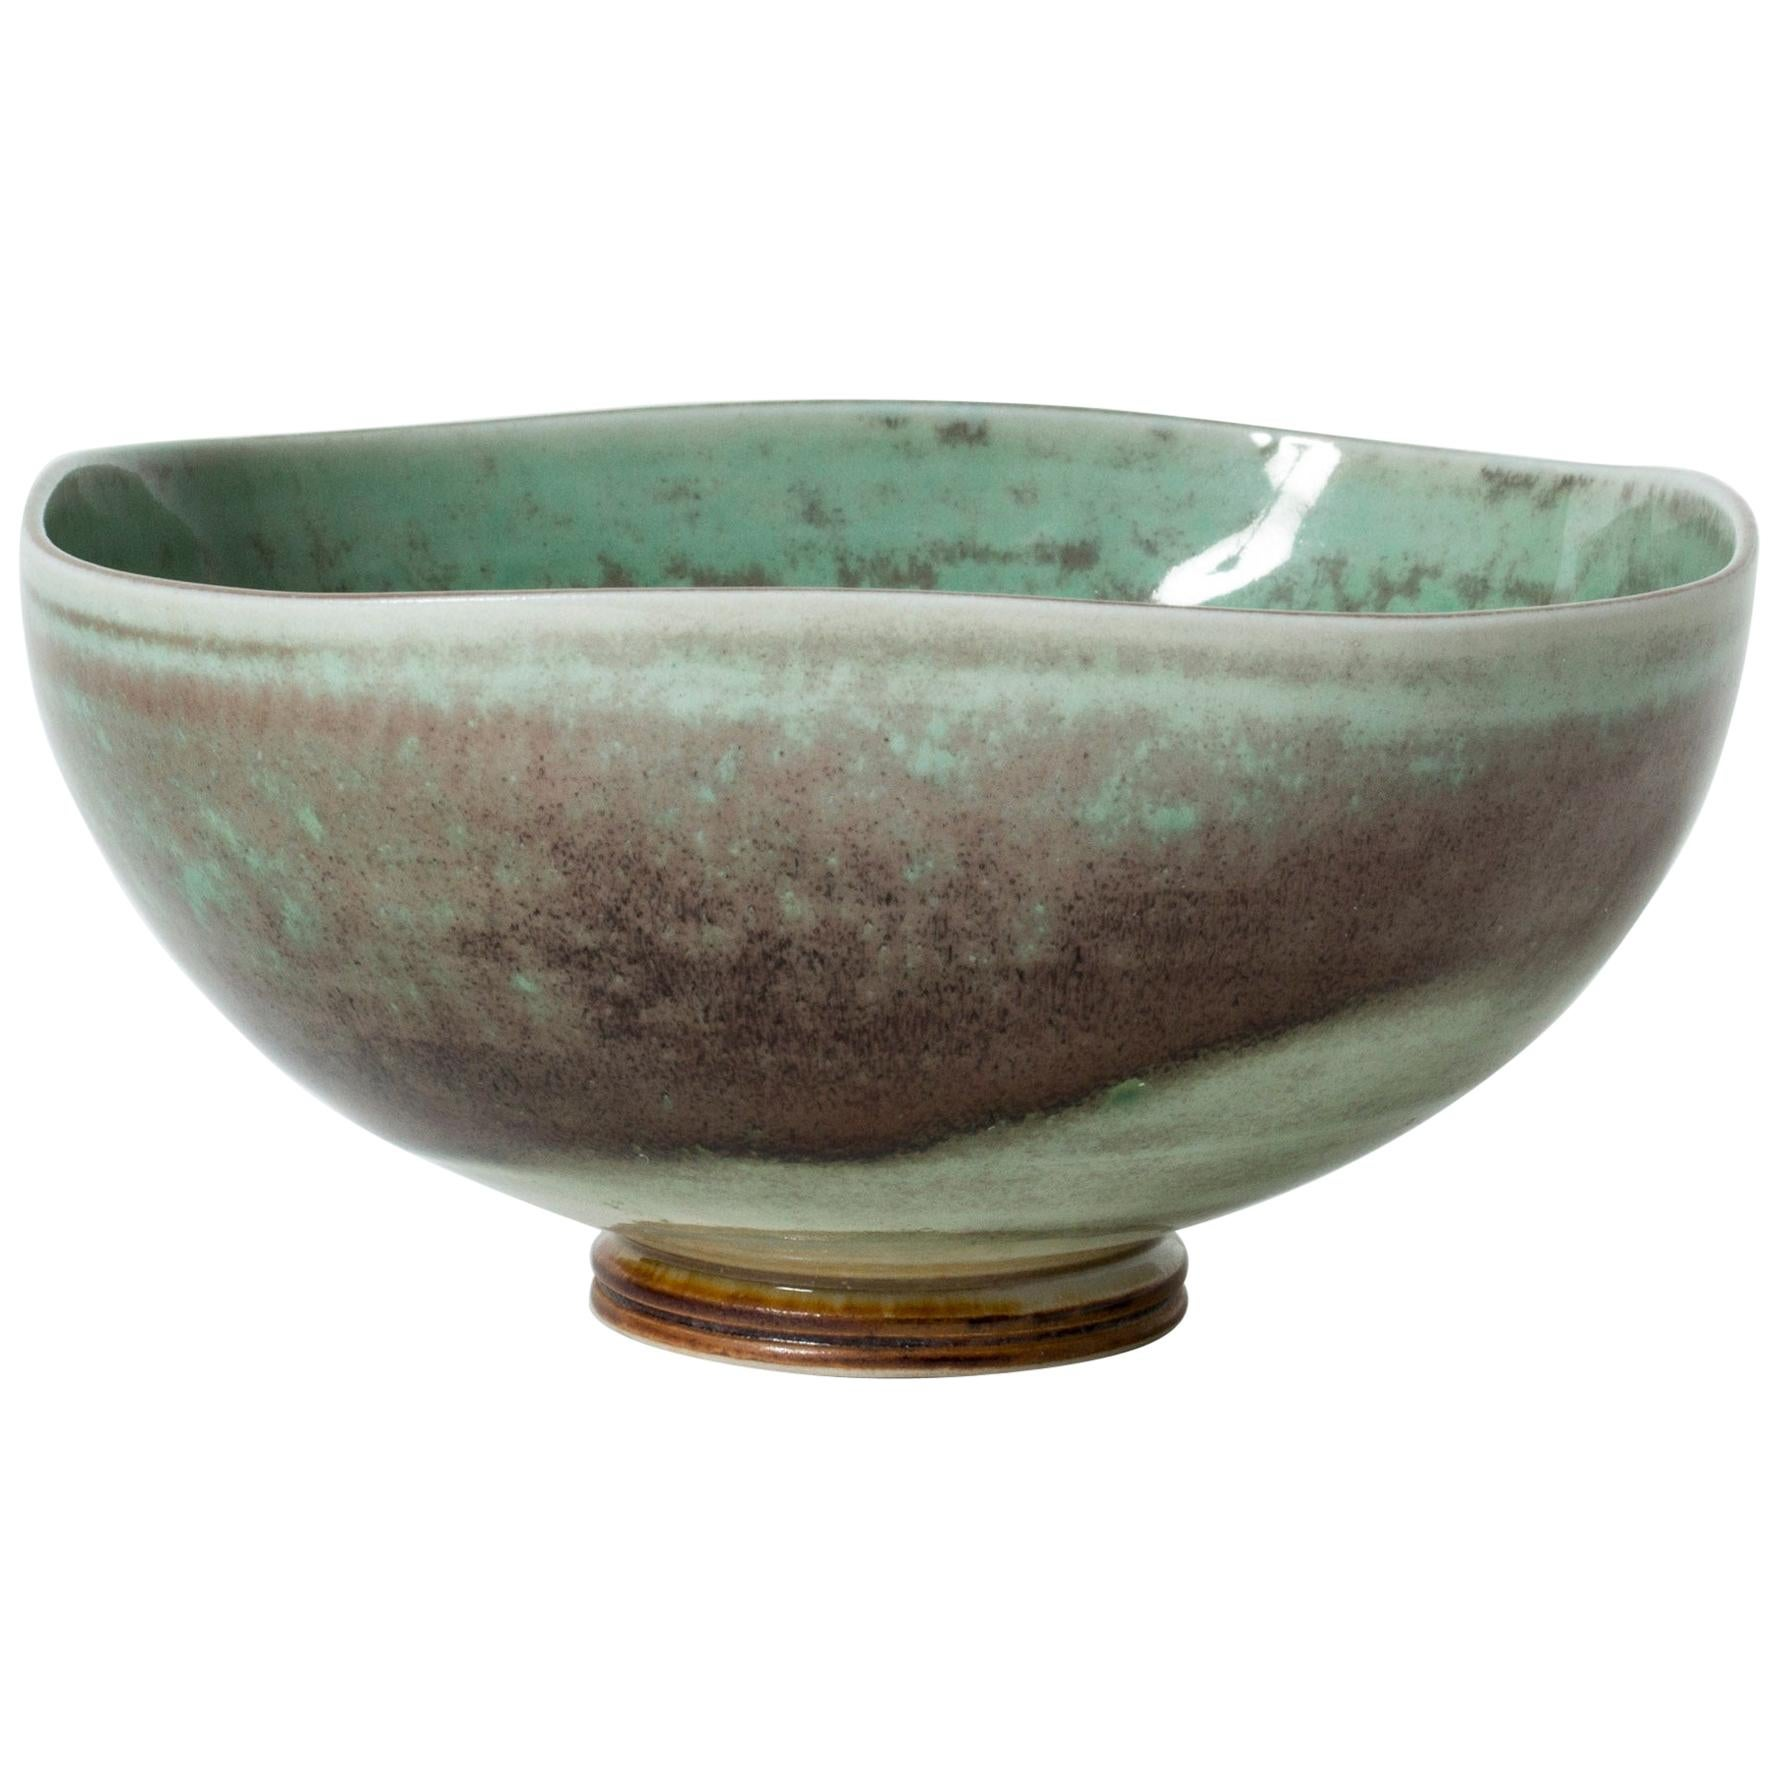 Stoneware Bowl by Berndt Friberg for Gustavsberg, Sweden, 1975